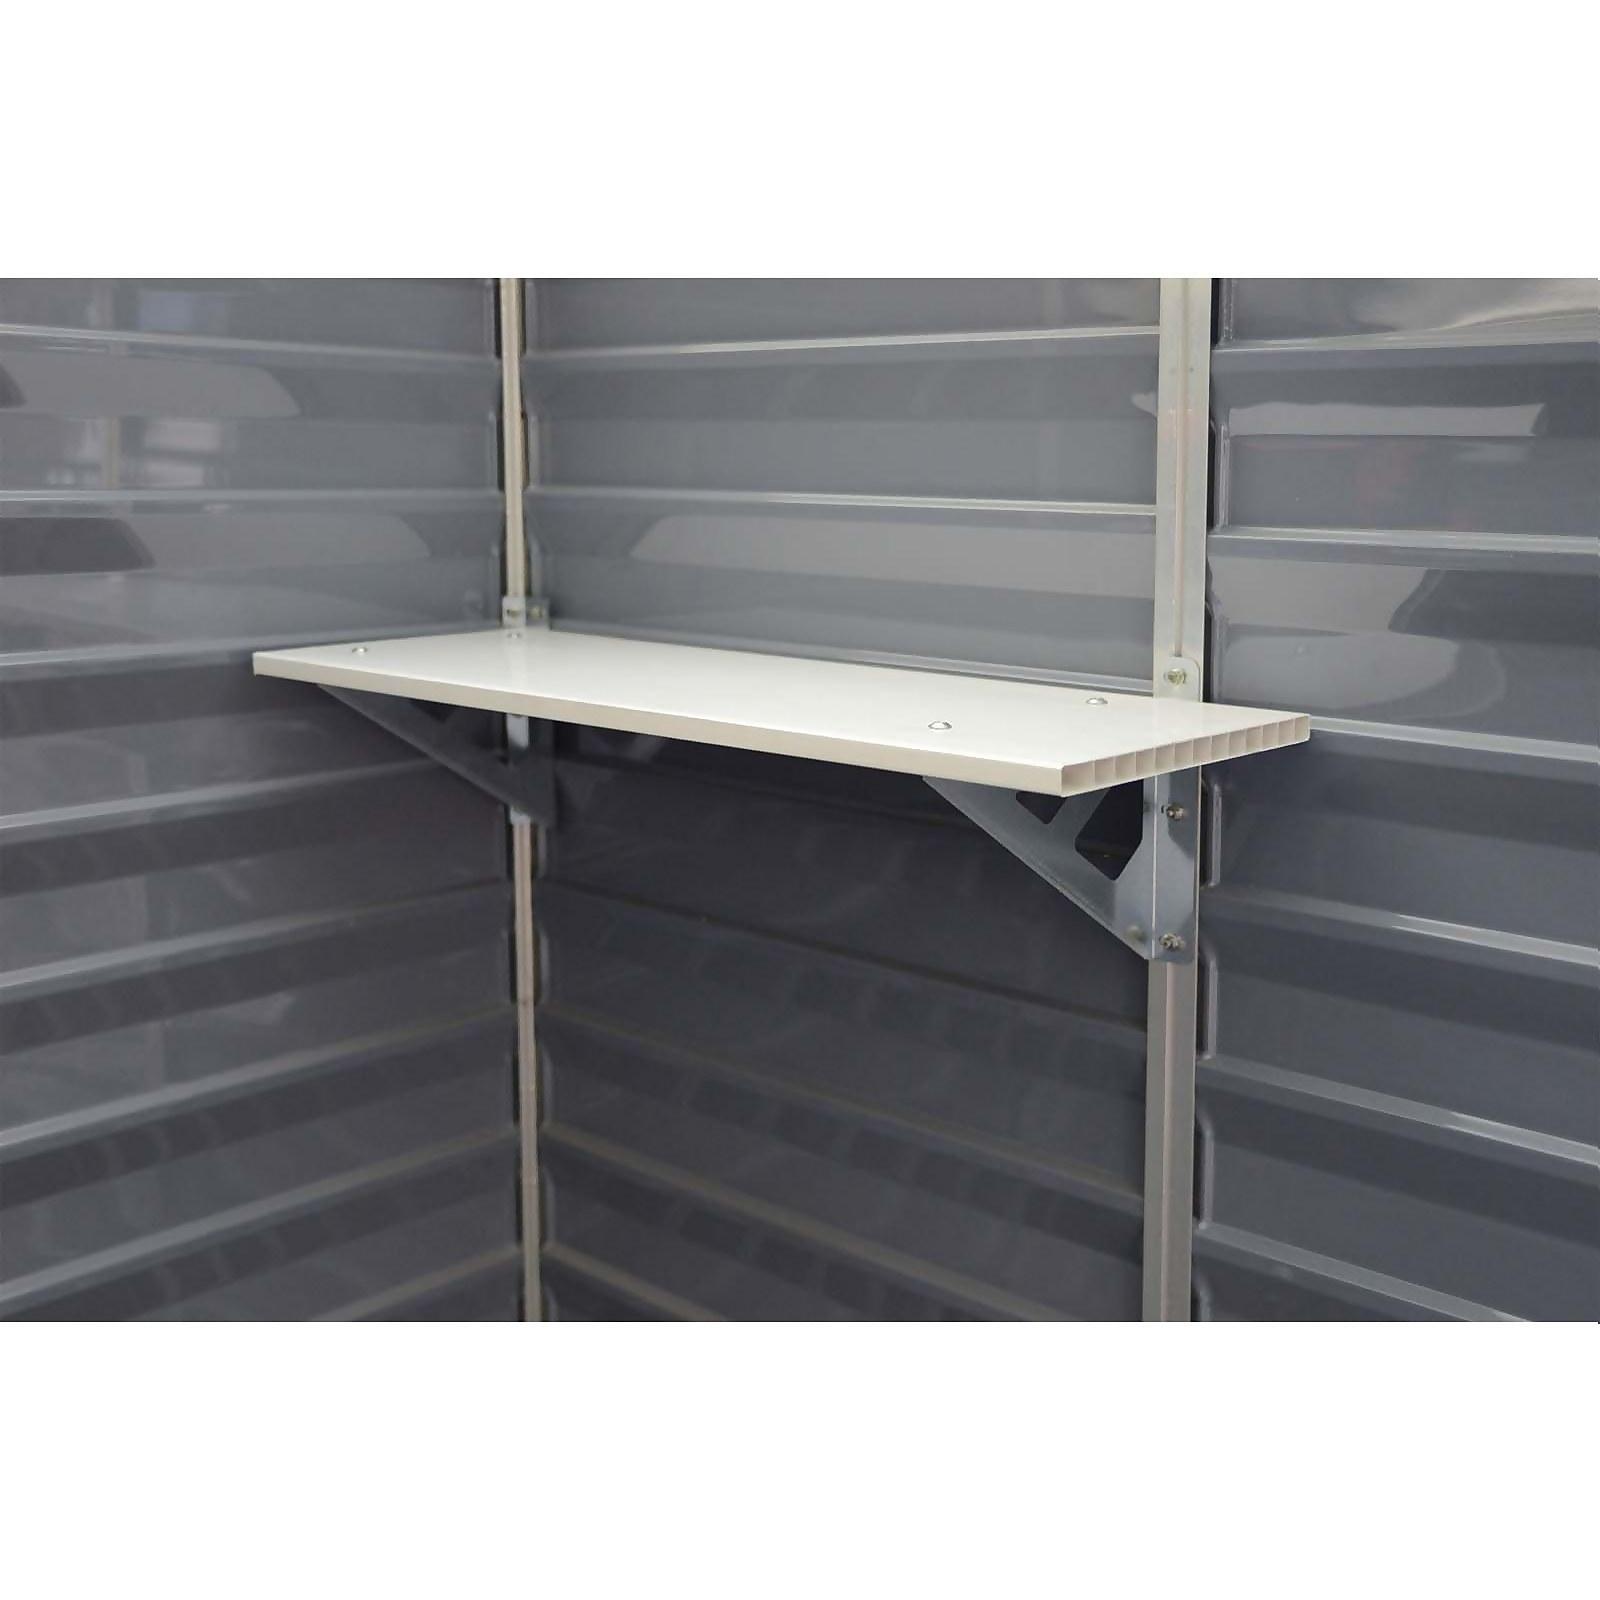 Palram - Canopia Skylight Shed Shelf Kit (Pack of 3)